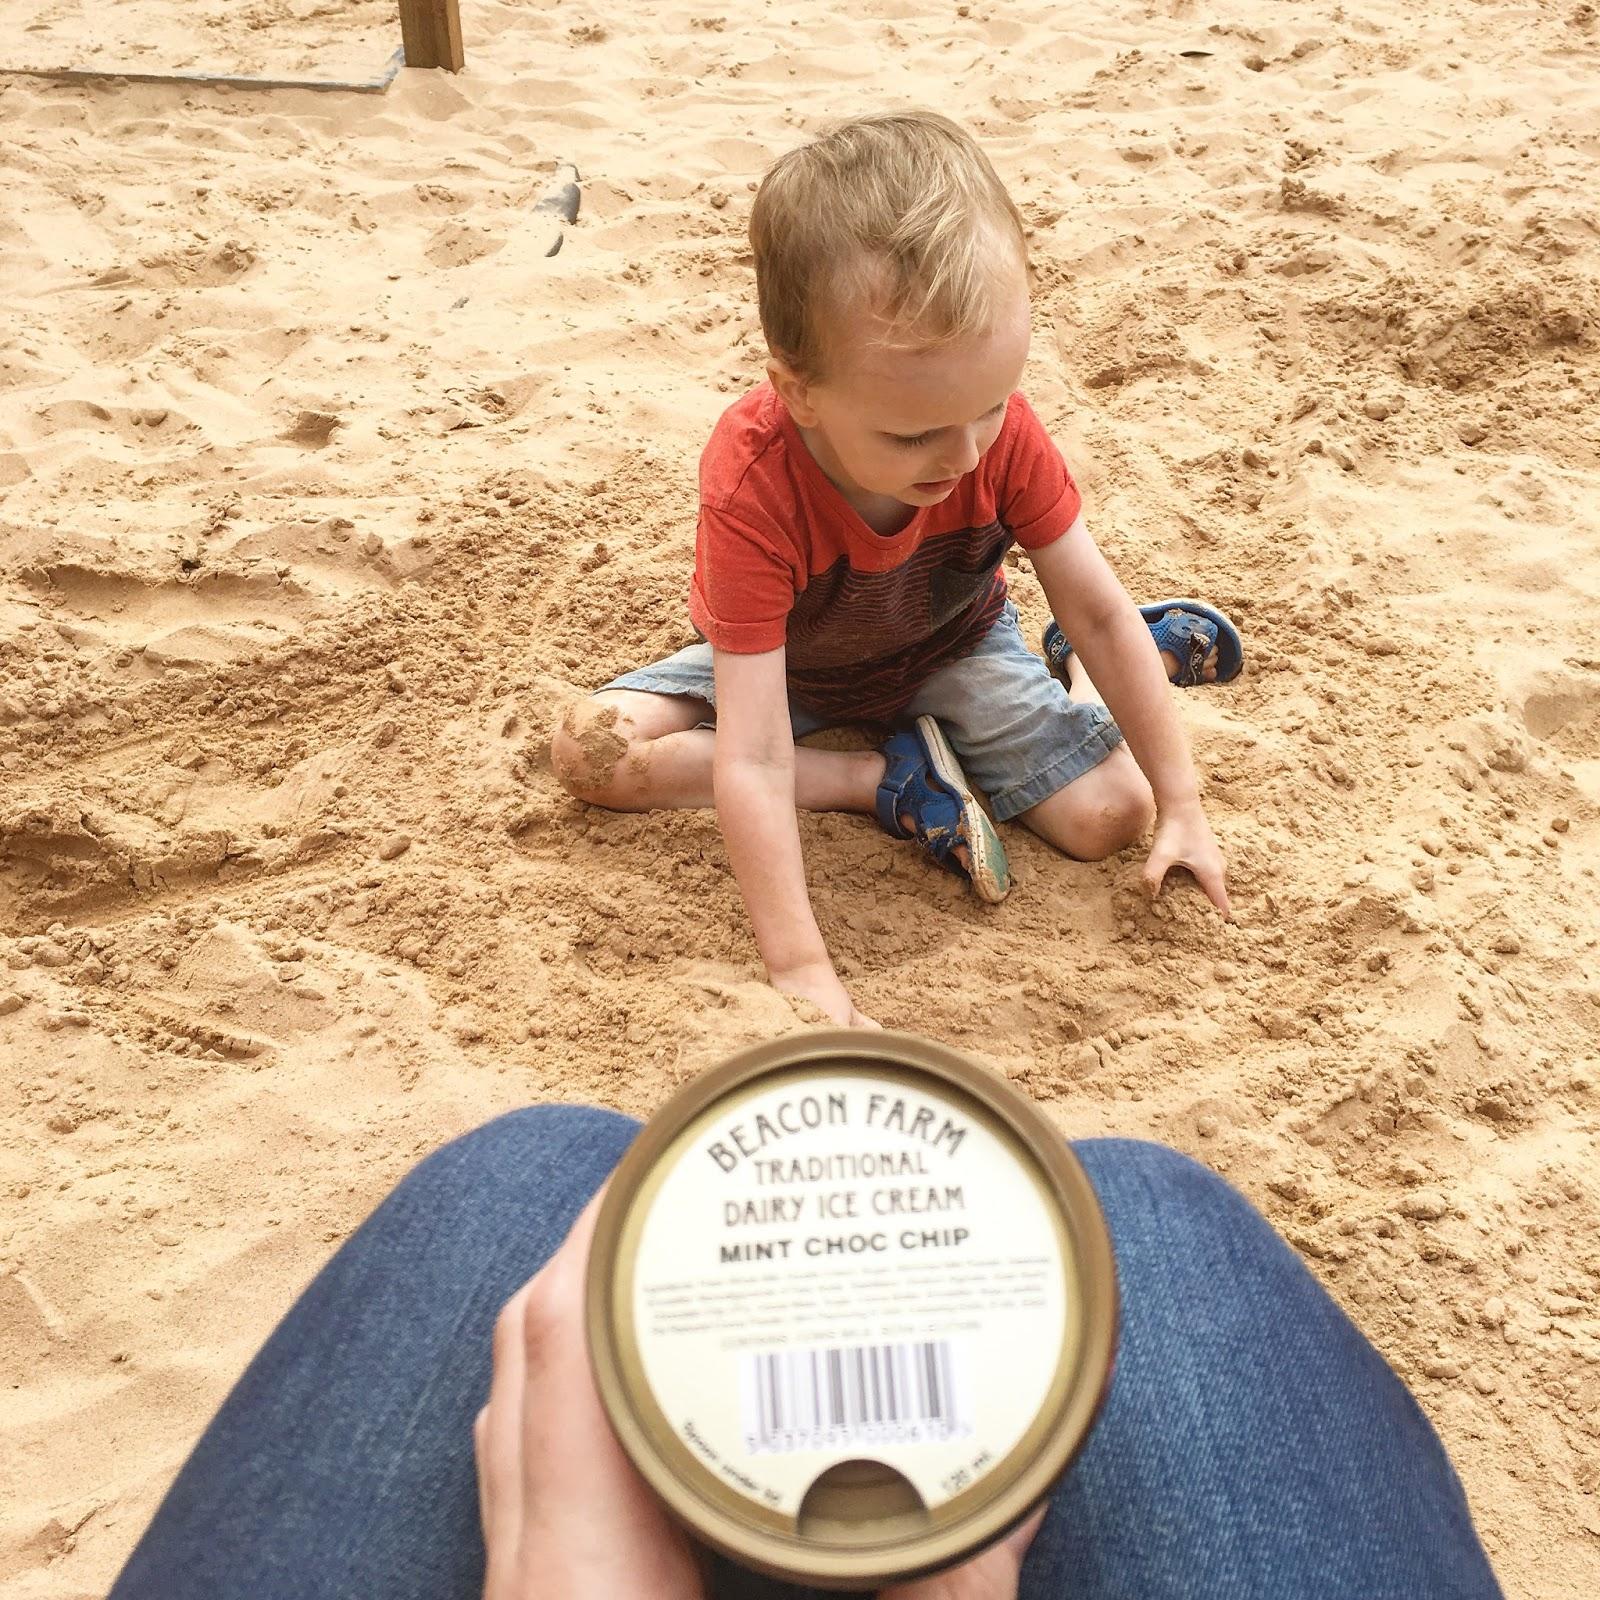 Preston Park Museum | Teddy Bears Picnic - A Review - beach and ice cream